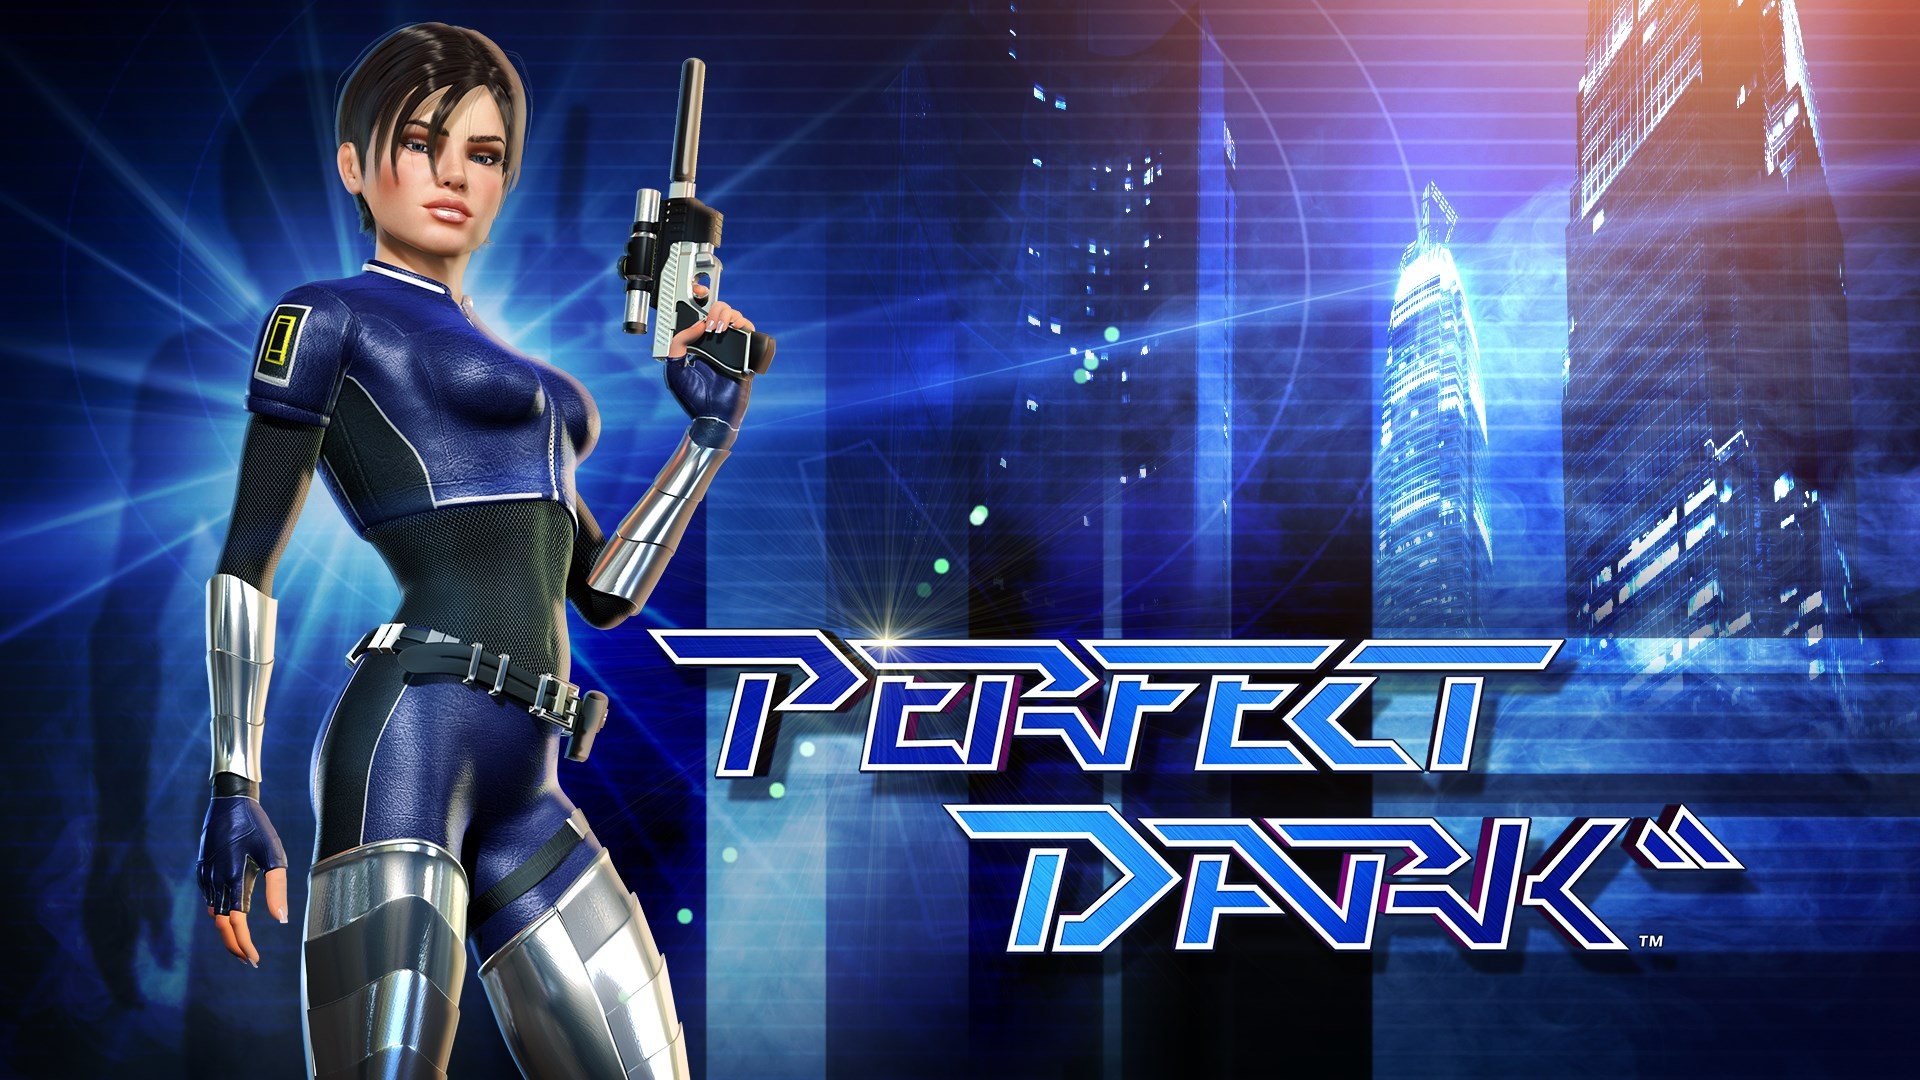 Perfect Dark X.